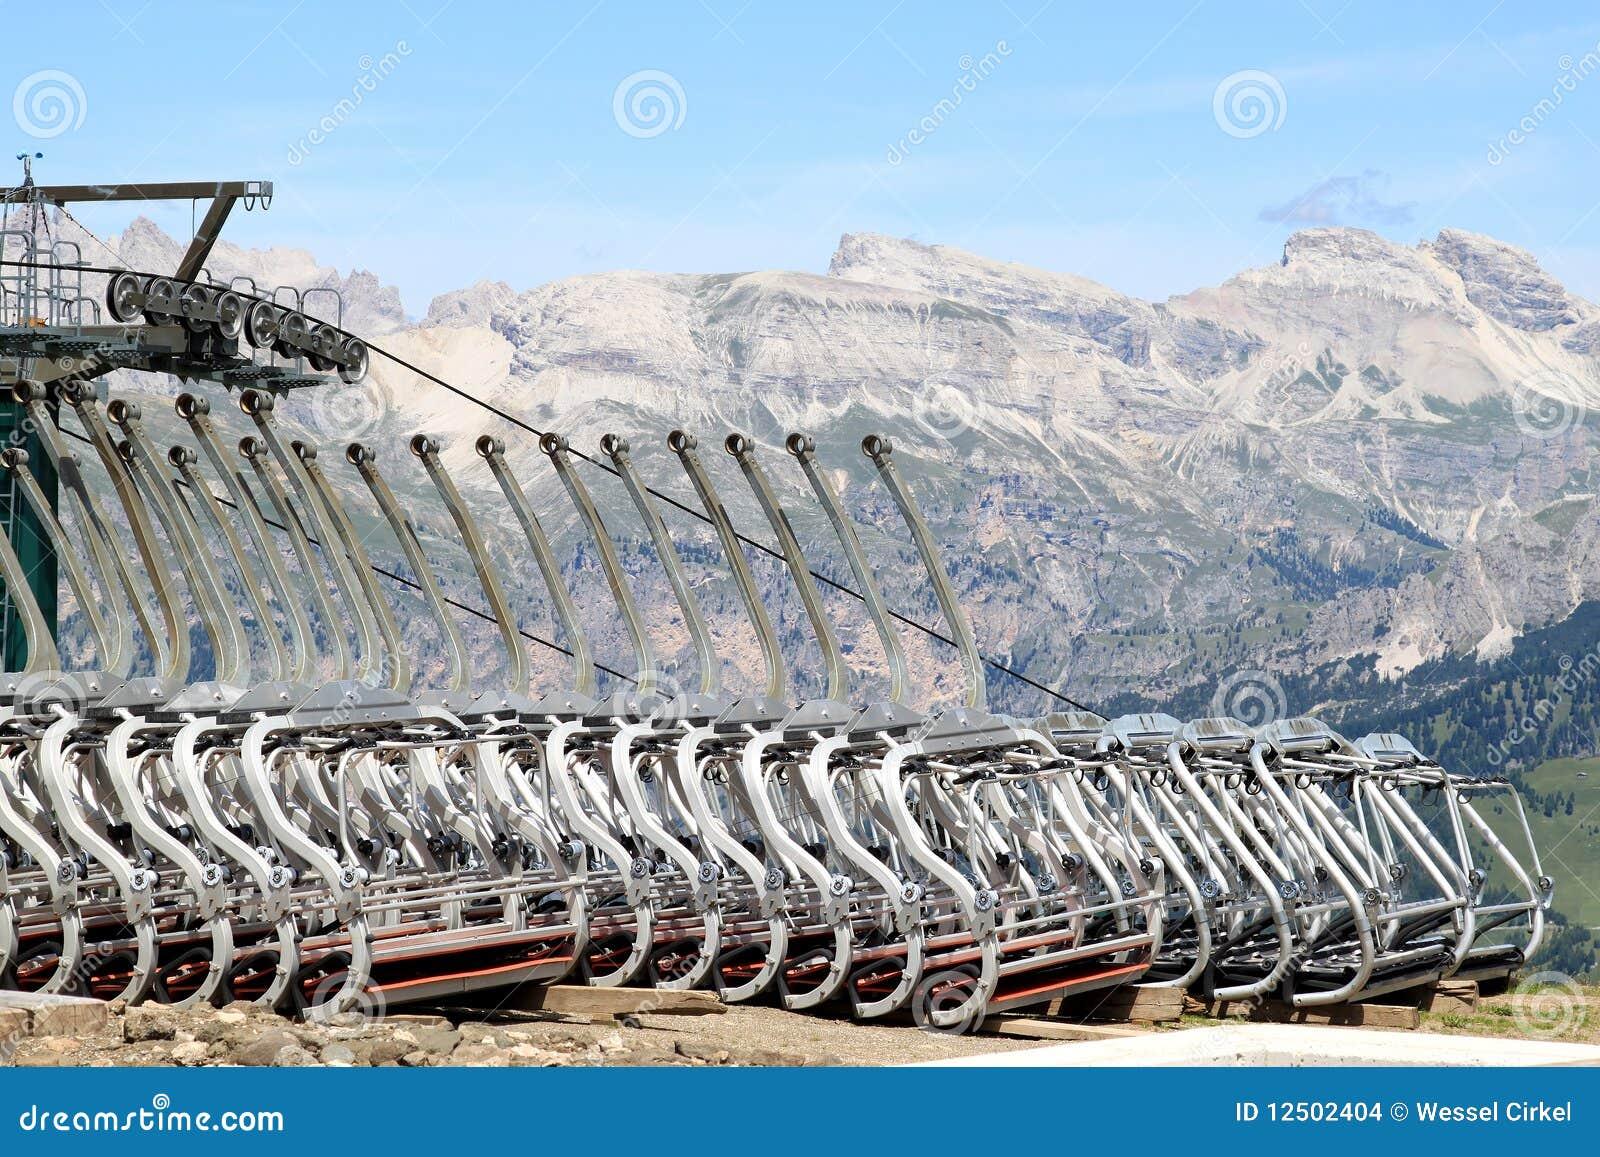 Teleféricos em cima da coluna Rodella, dolomites italianas